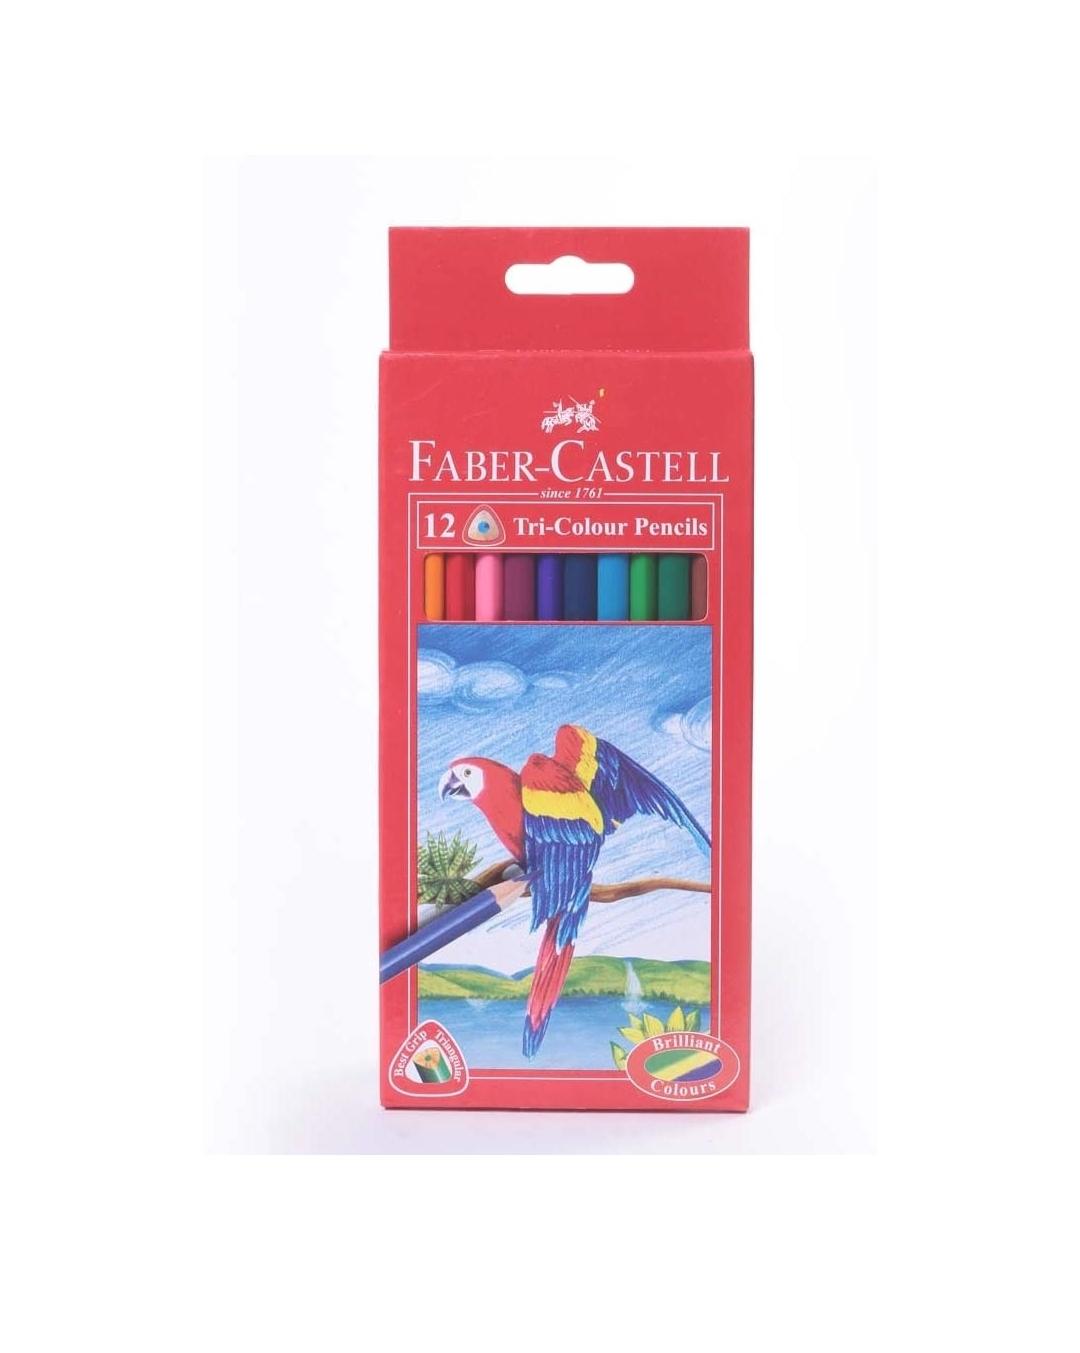 Faber Castell Colour ME Grip Triangular Shape Regular Size Colour Pencil Assorted Pack of 12